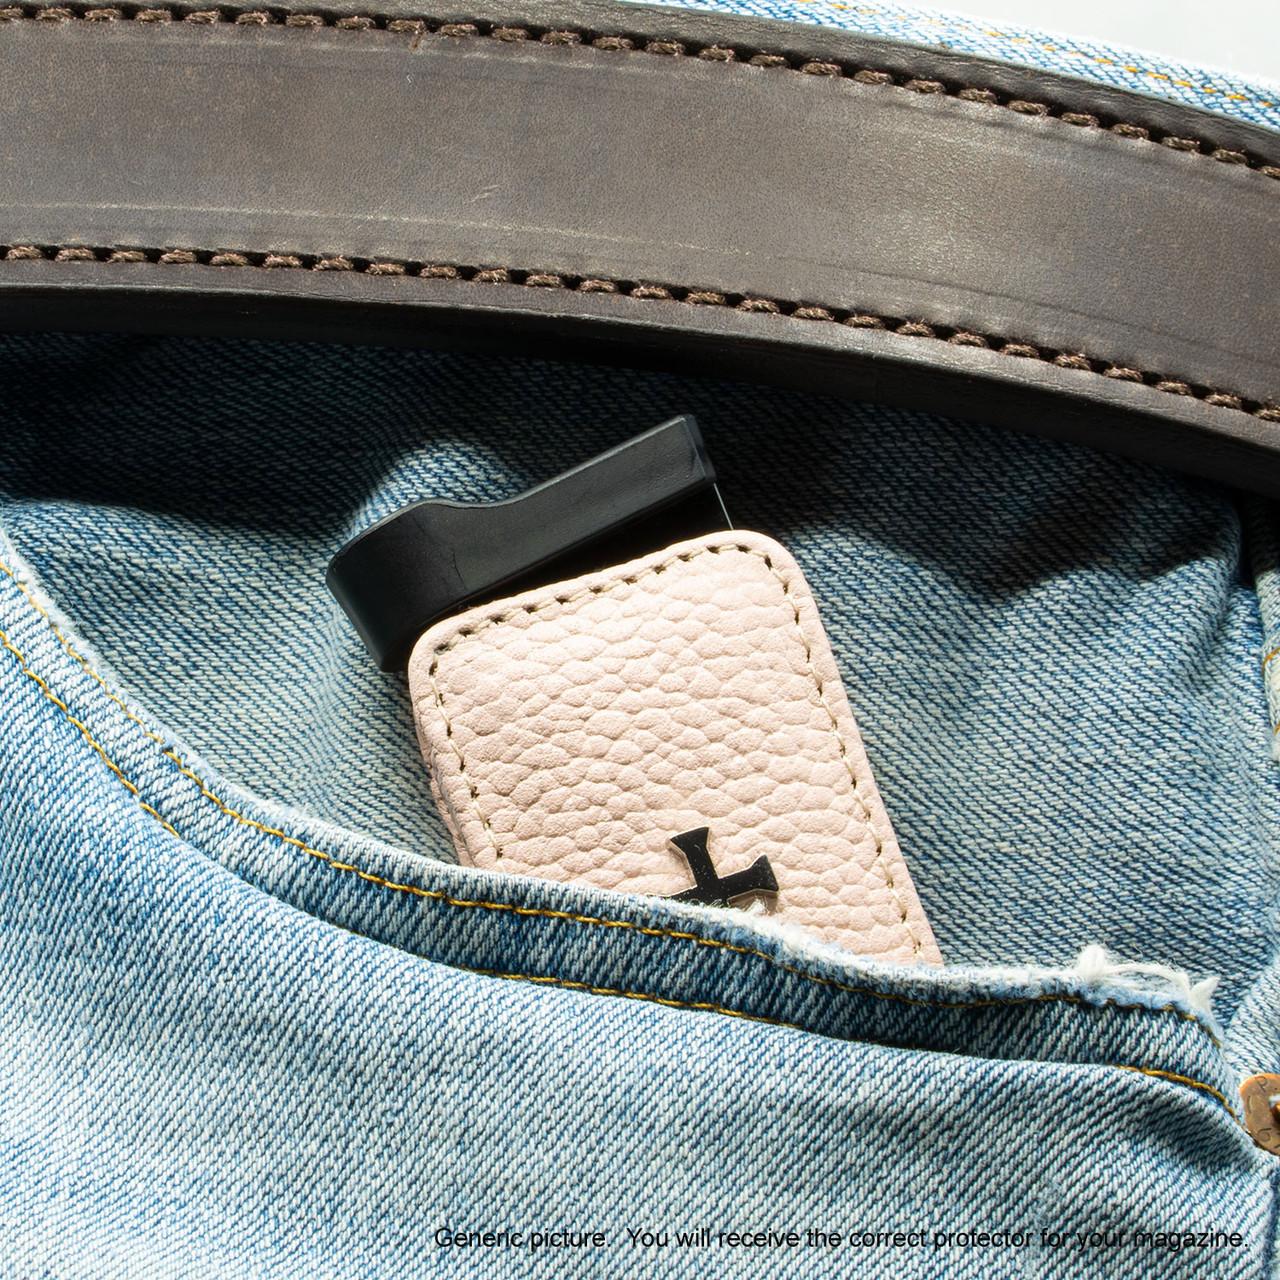 Honor Guard Pink Carry Faithfully Cross Magazine Pocket Protector